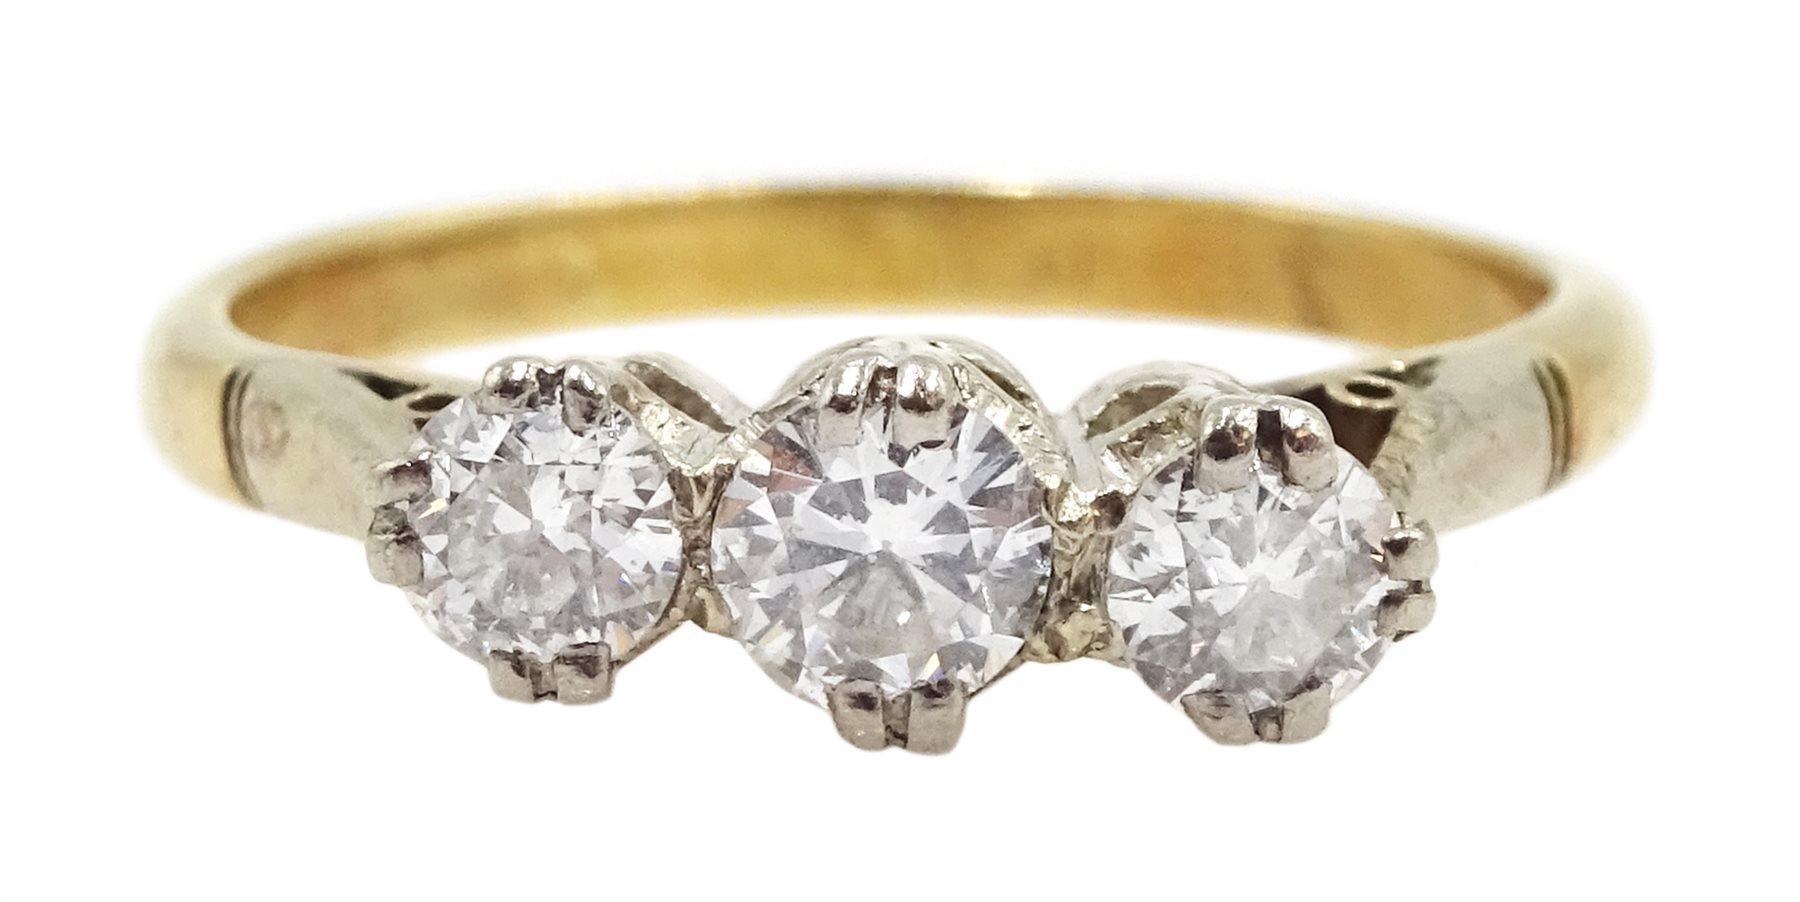 15ct gold three stone round brilliant cut diamond ring, total diamond weight approx 0.40 carat